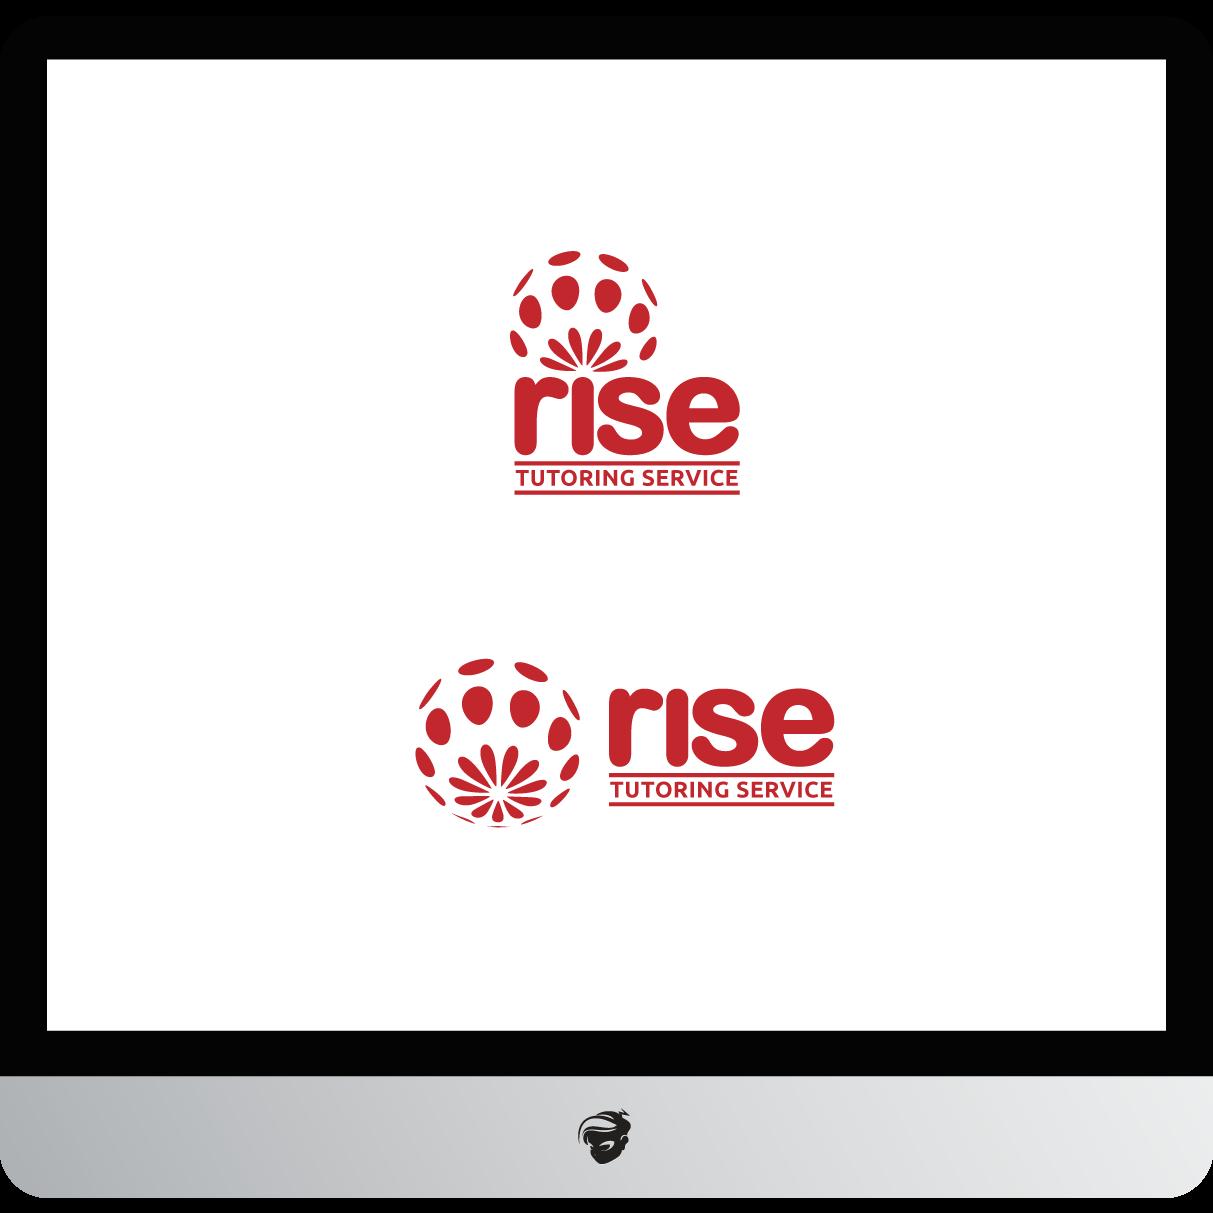 Logo Design by zesthar - Entry No. 231 in the Logo Design Contest Imaginative Logo Design for Rise Tutoring Service.